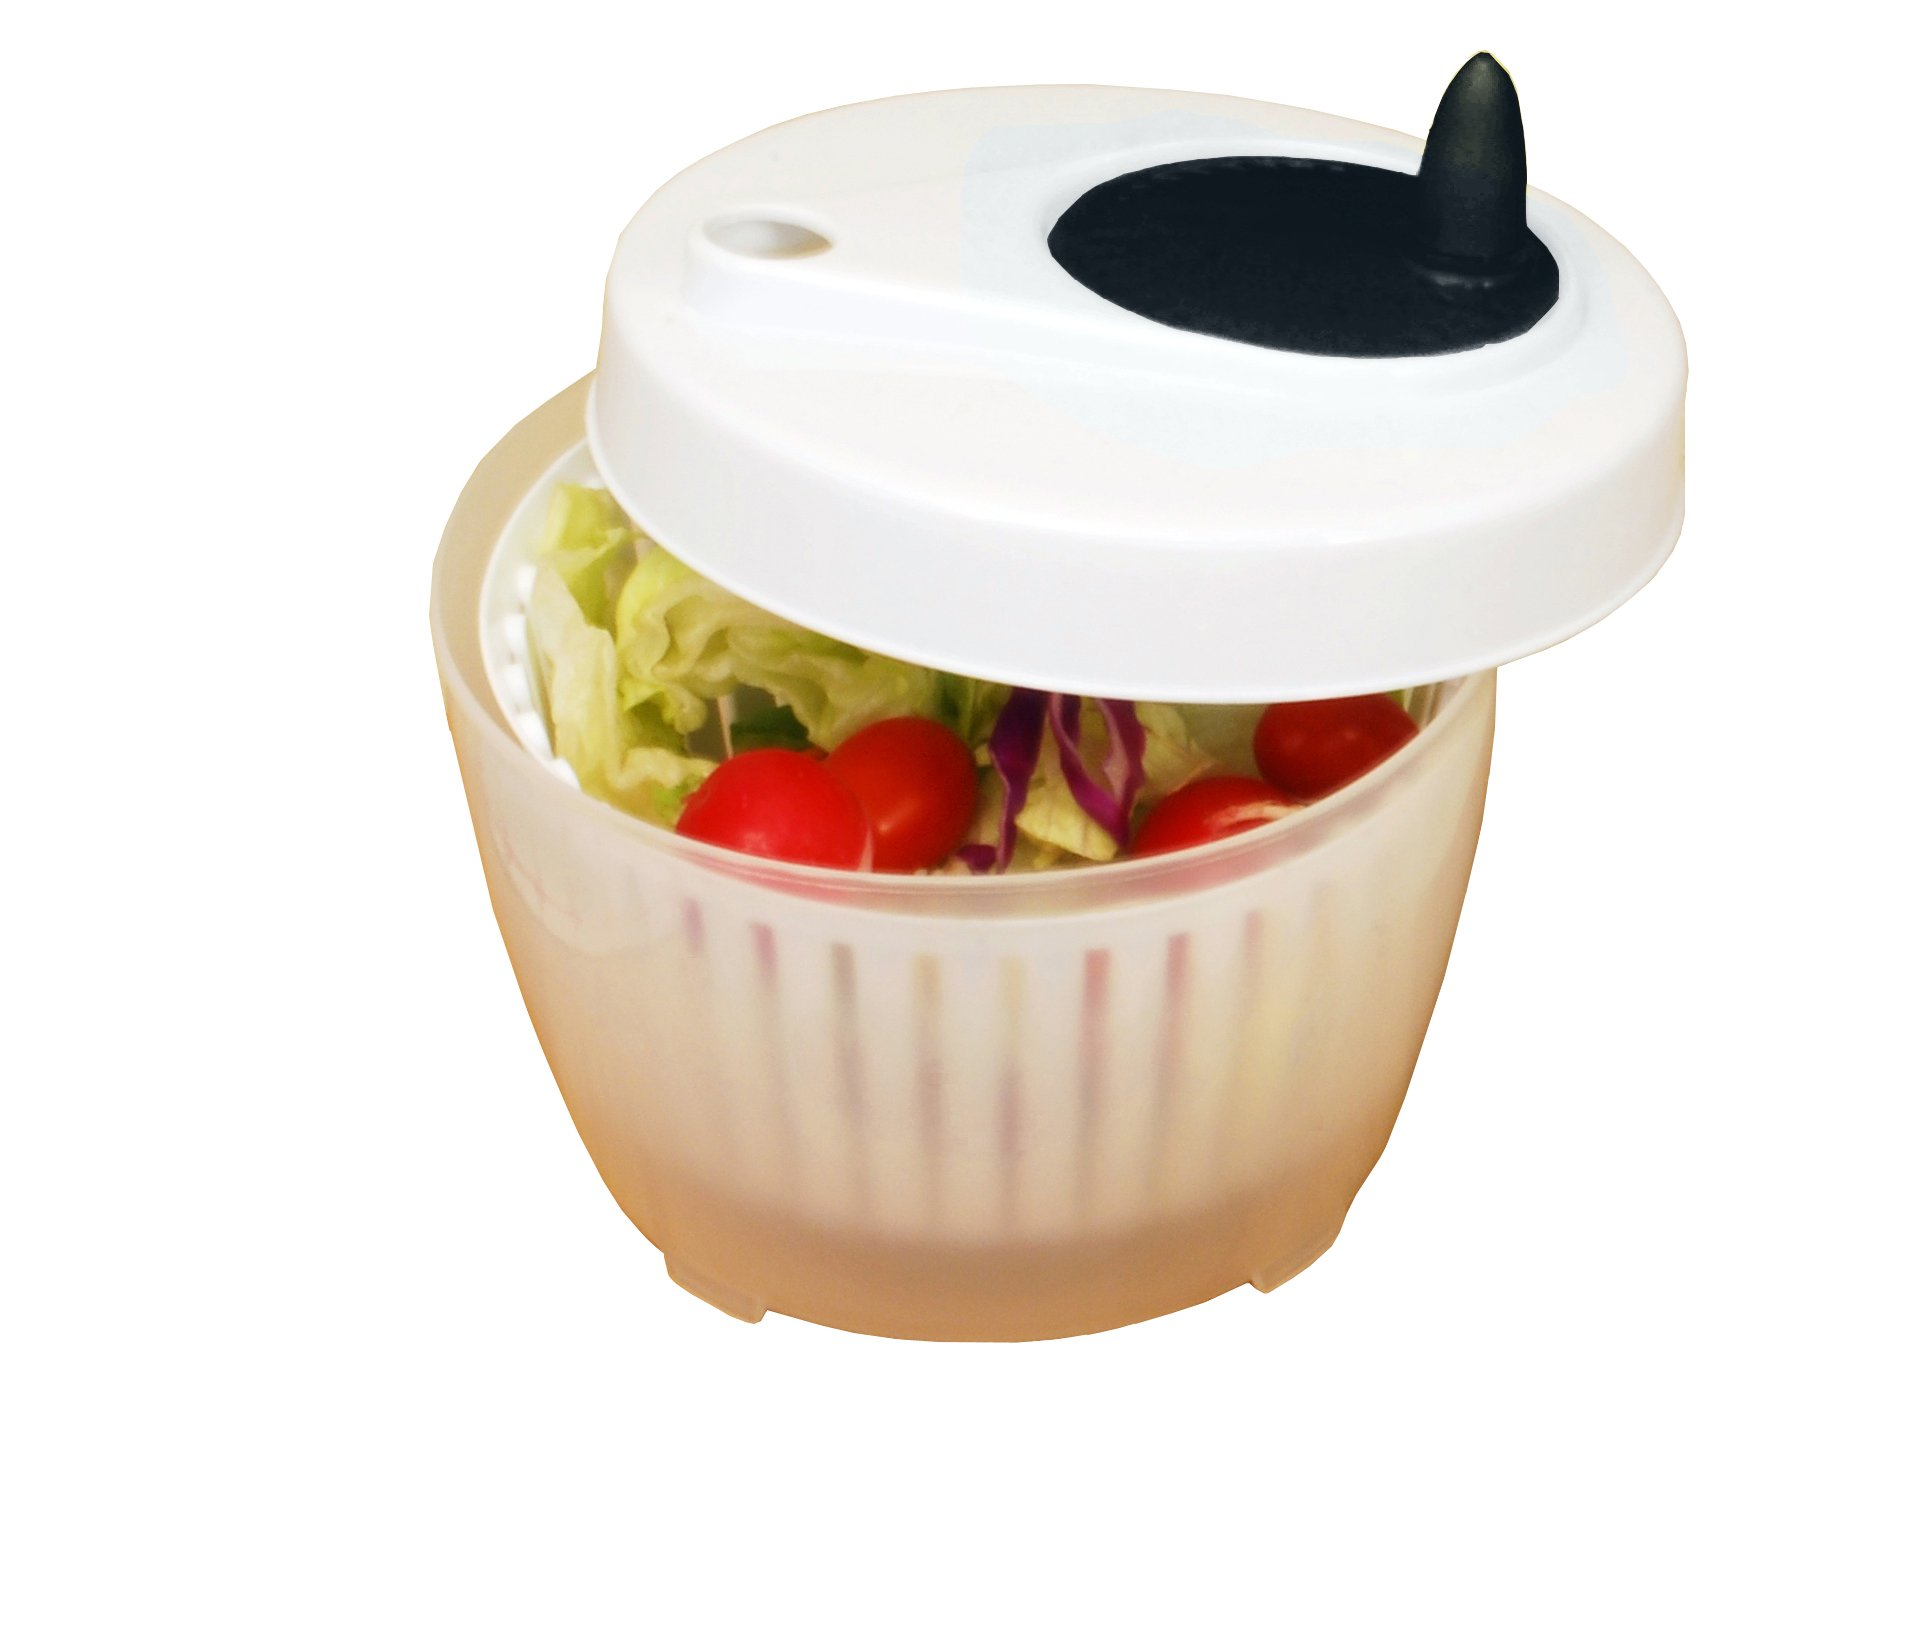 Excelsteel Cook Pro Inc Mini Salad Spinner, 1.4-Quart